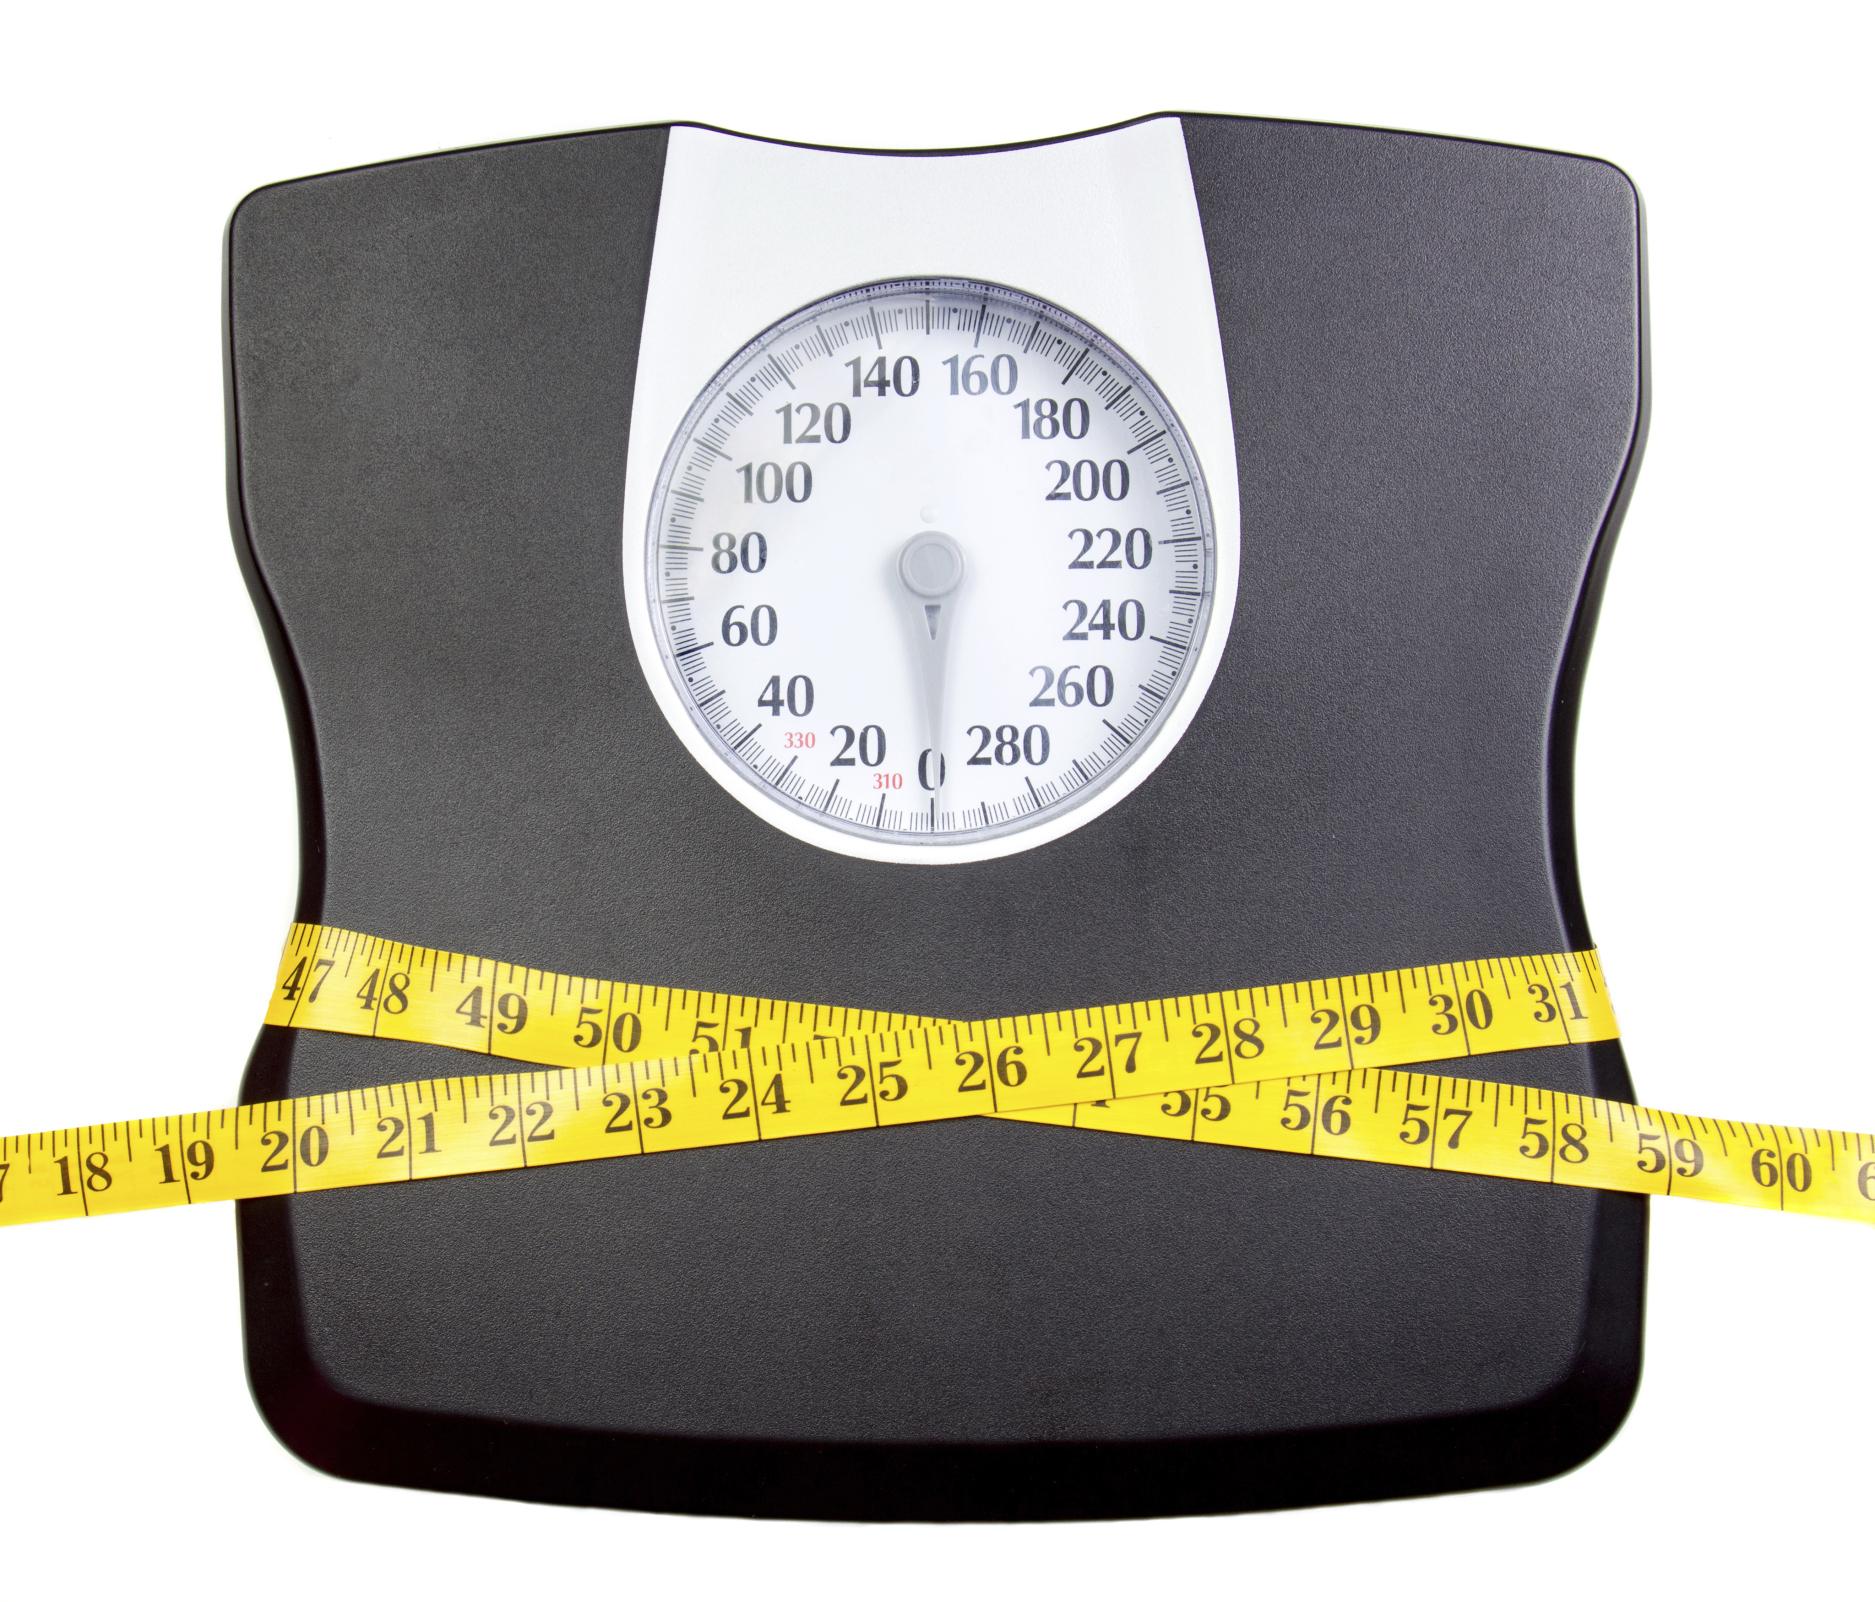 mama june weight loss video reviews